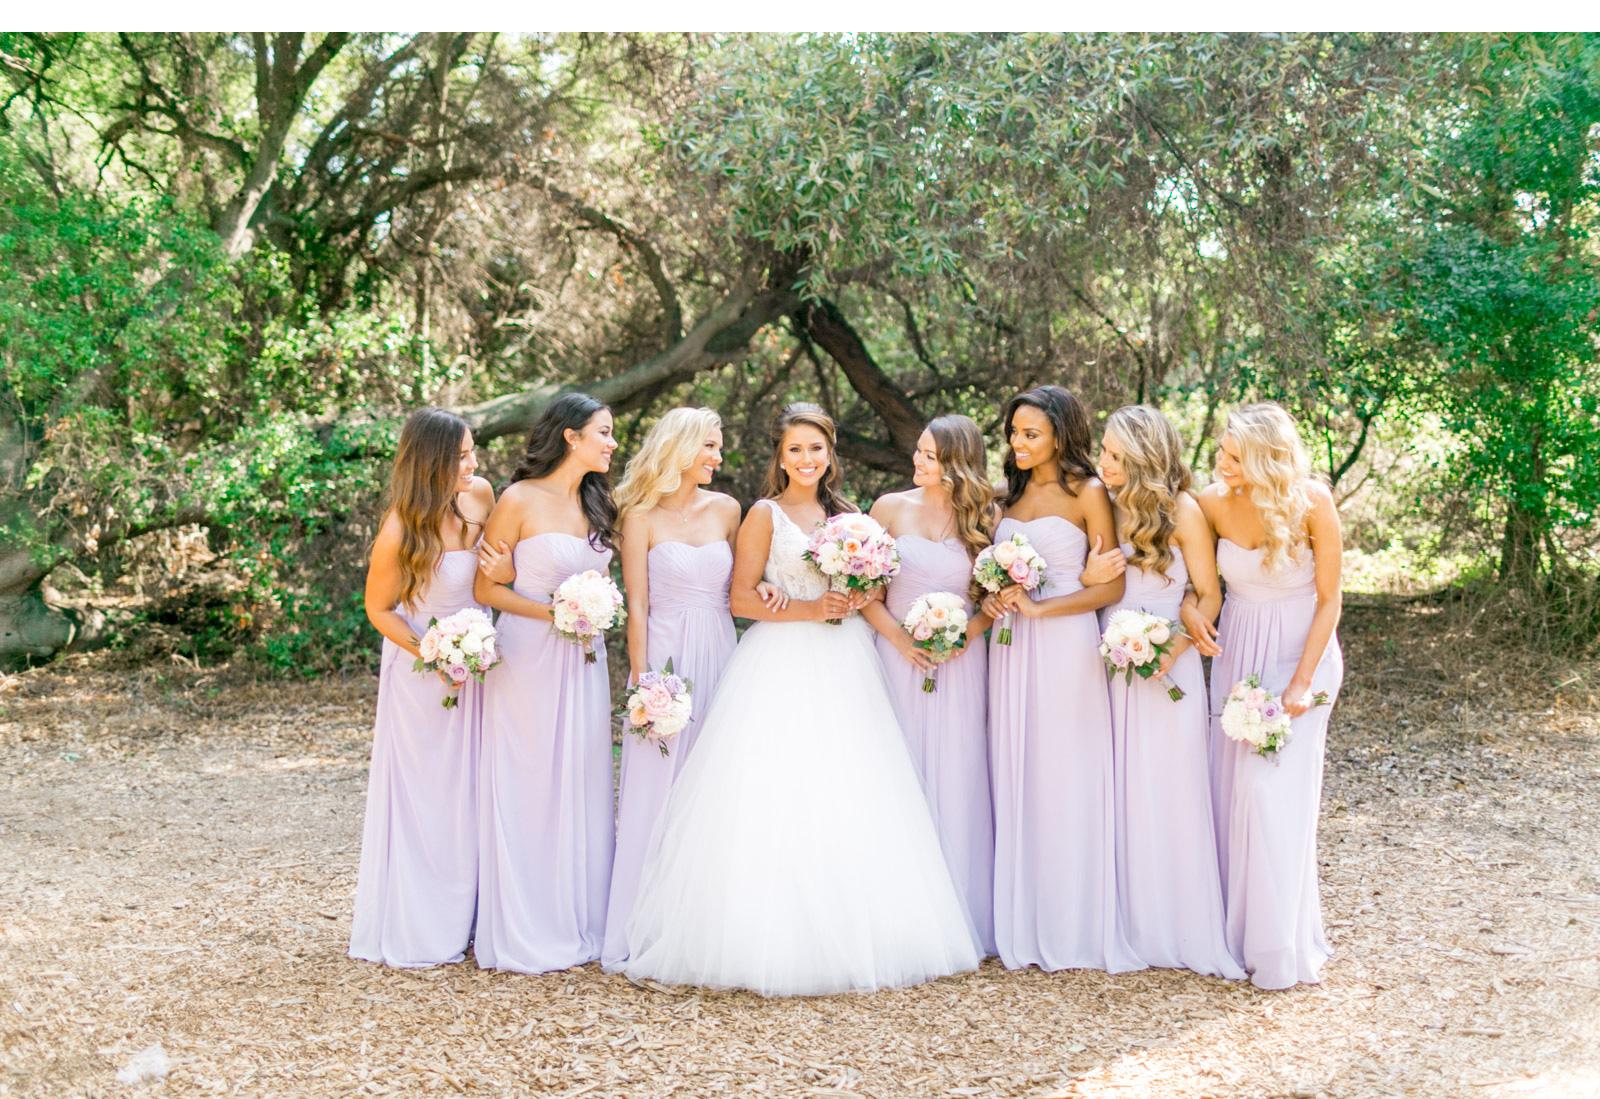 Miss-USA-Temecula-Wedding-Natalie-Schutt-Photography_05.jpg